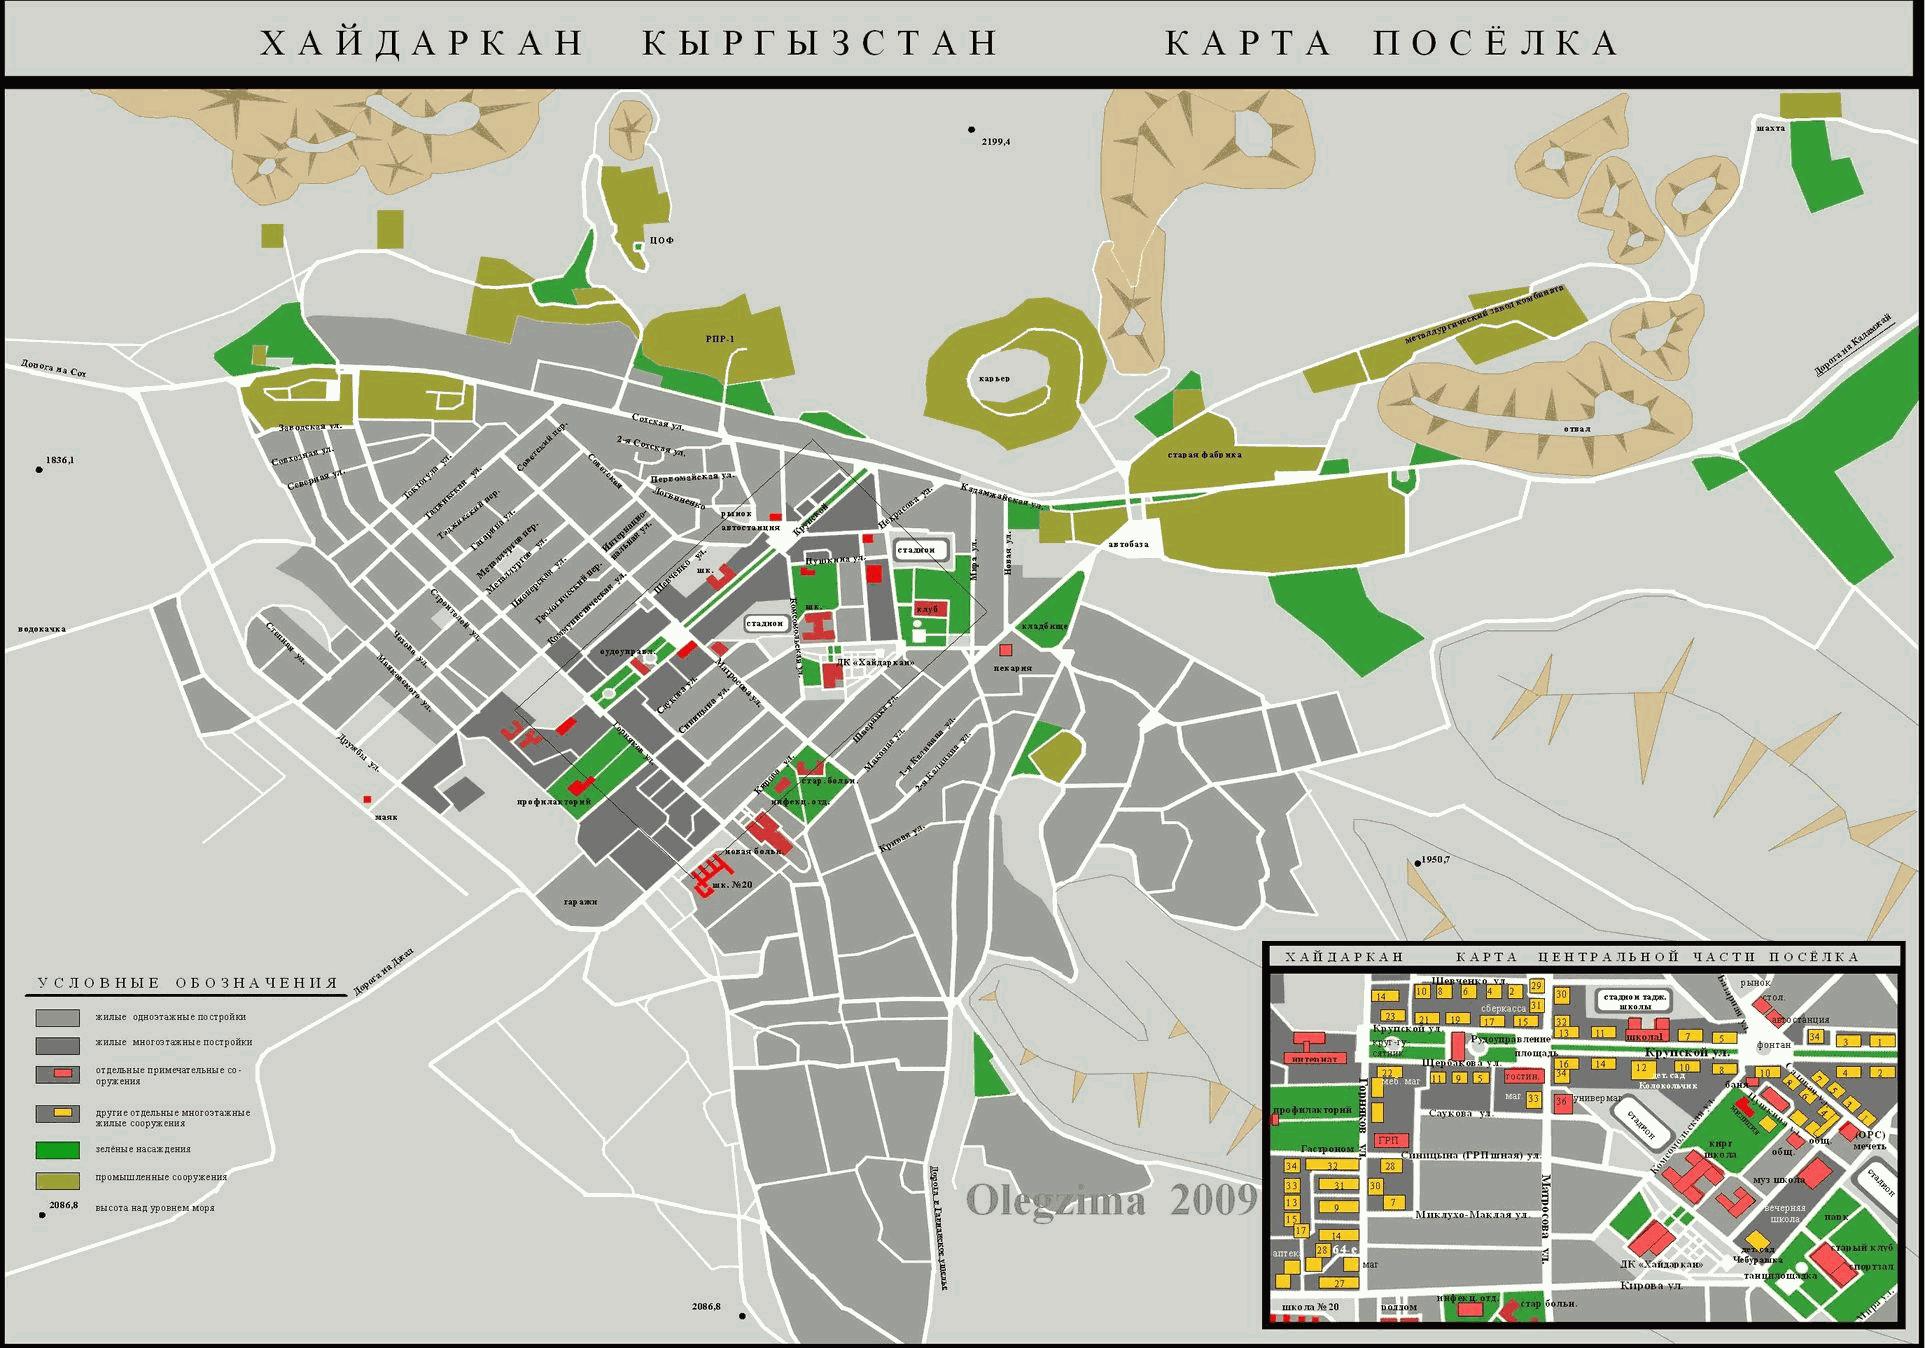 Карта посёлка Хайдаркан (Киргизская Республика)